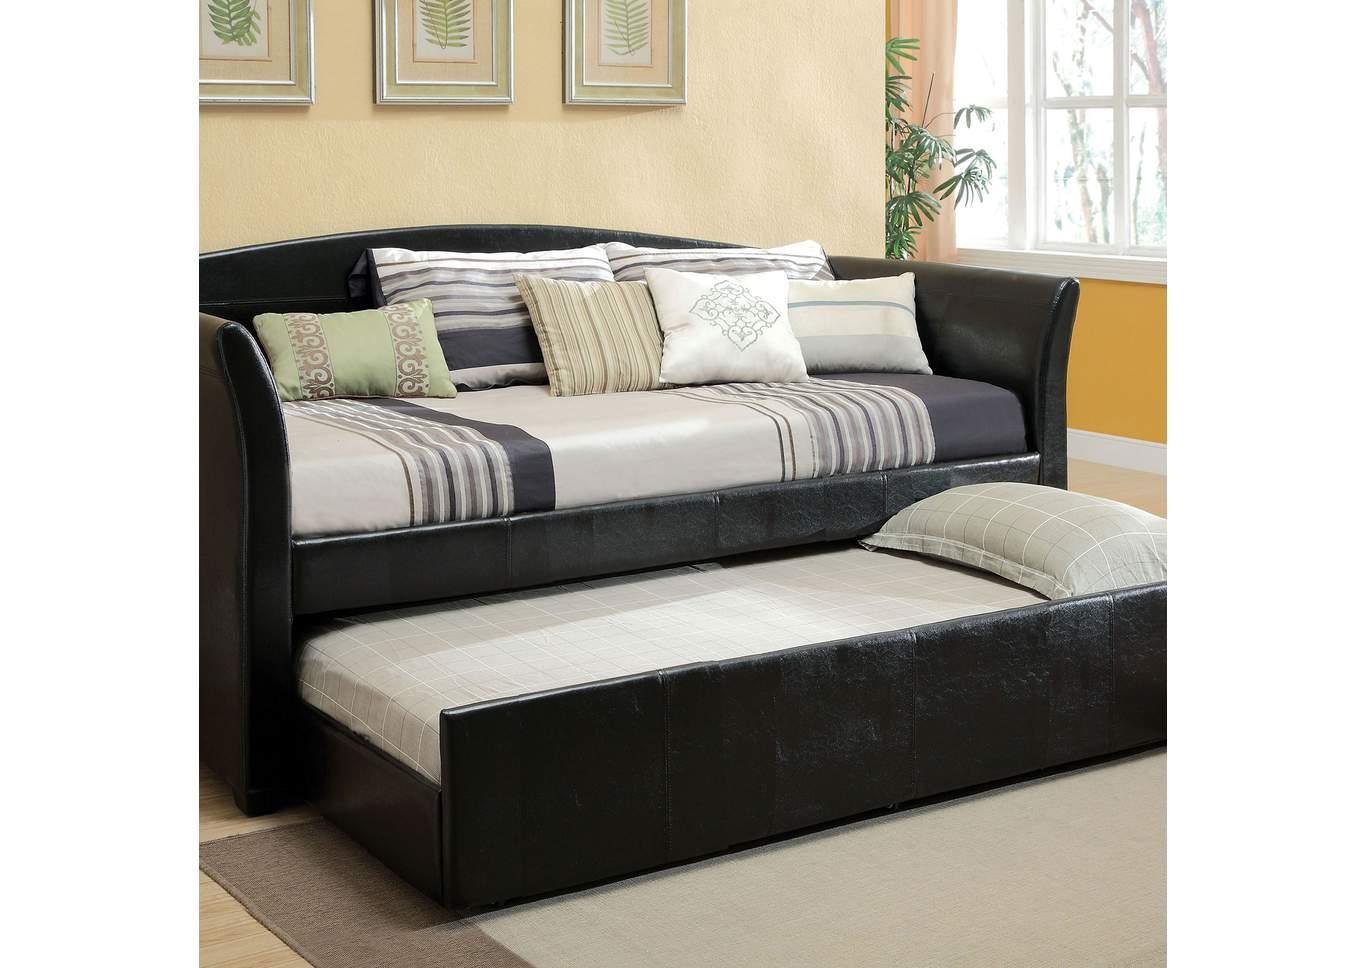 Superbe Delmar Black Daybed W/Twin Trundle U0026 Casters,Furniture Of America